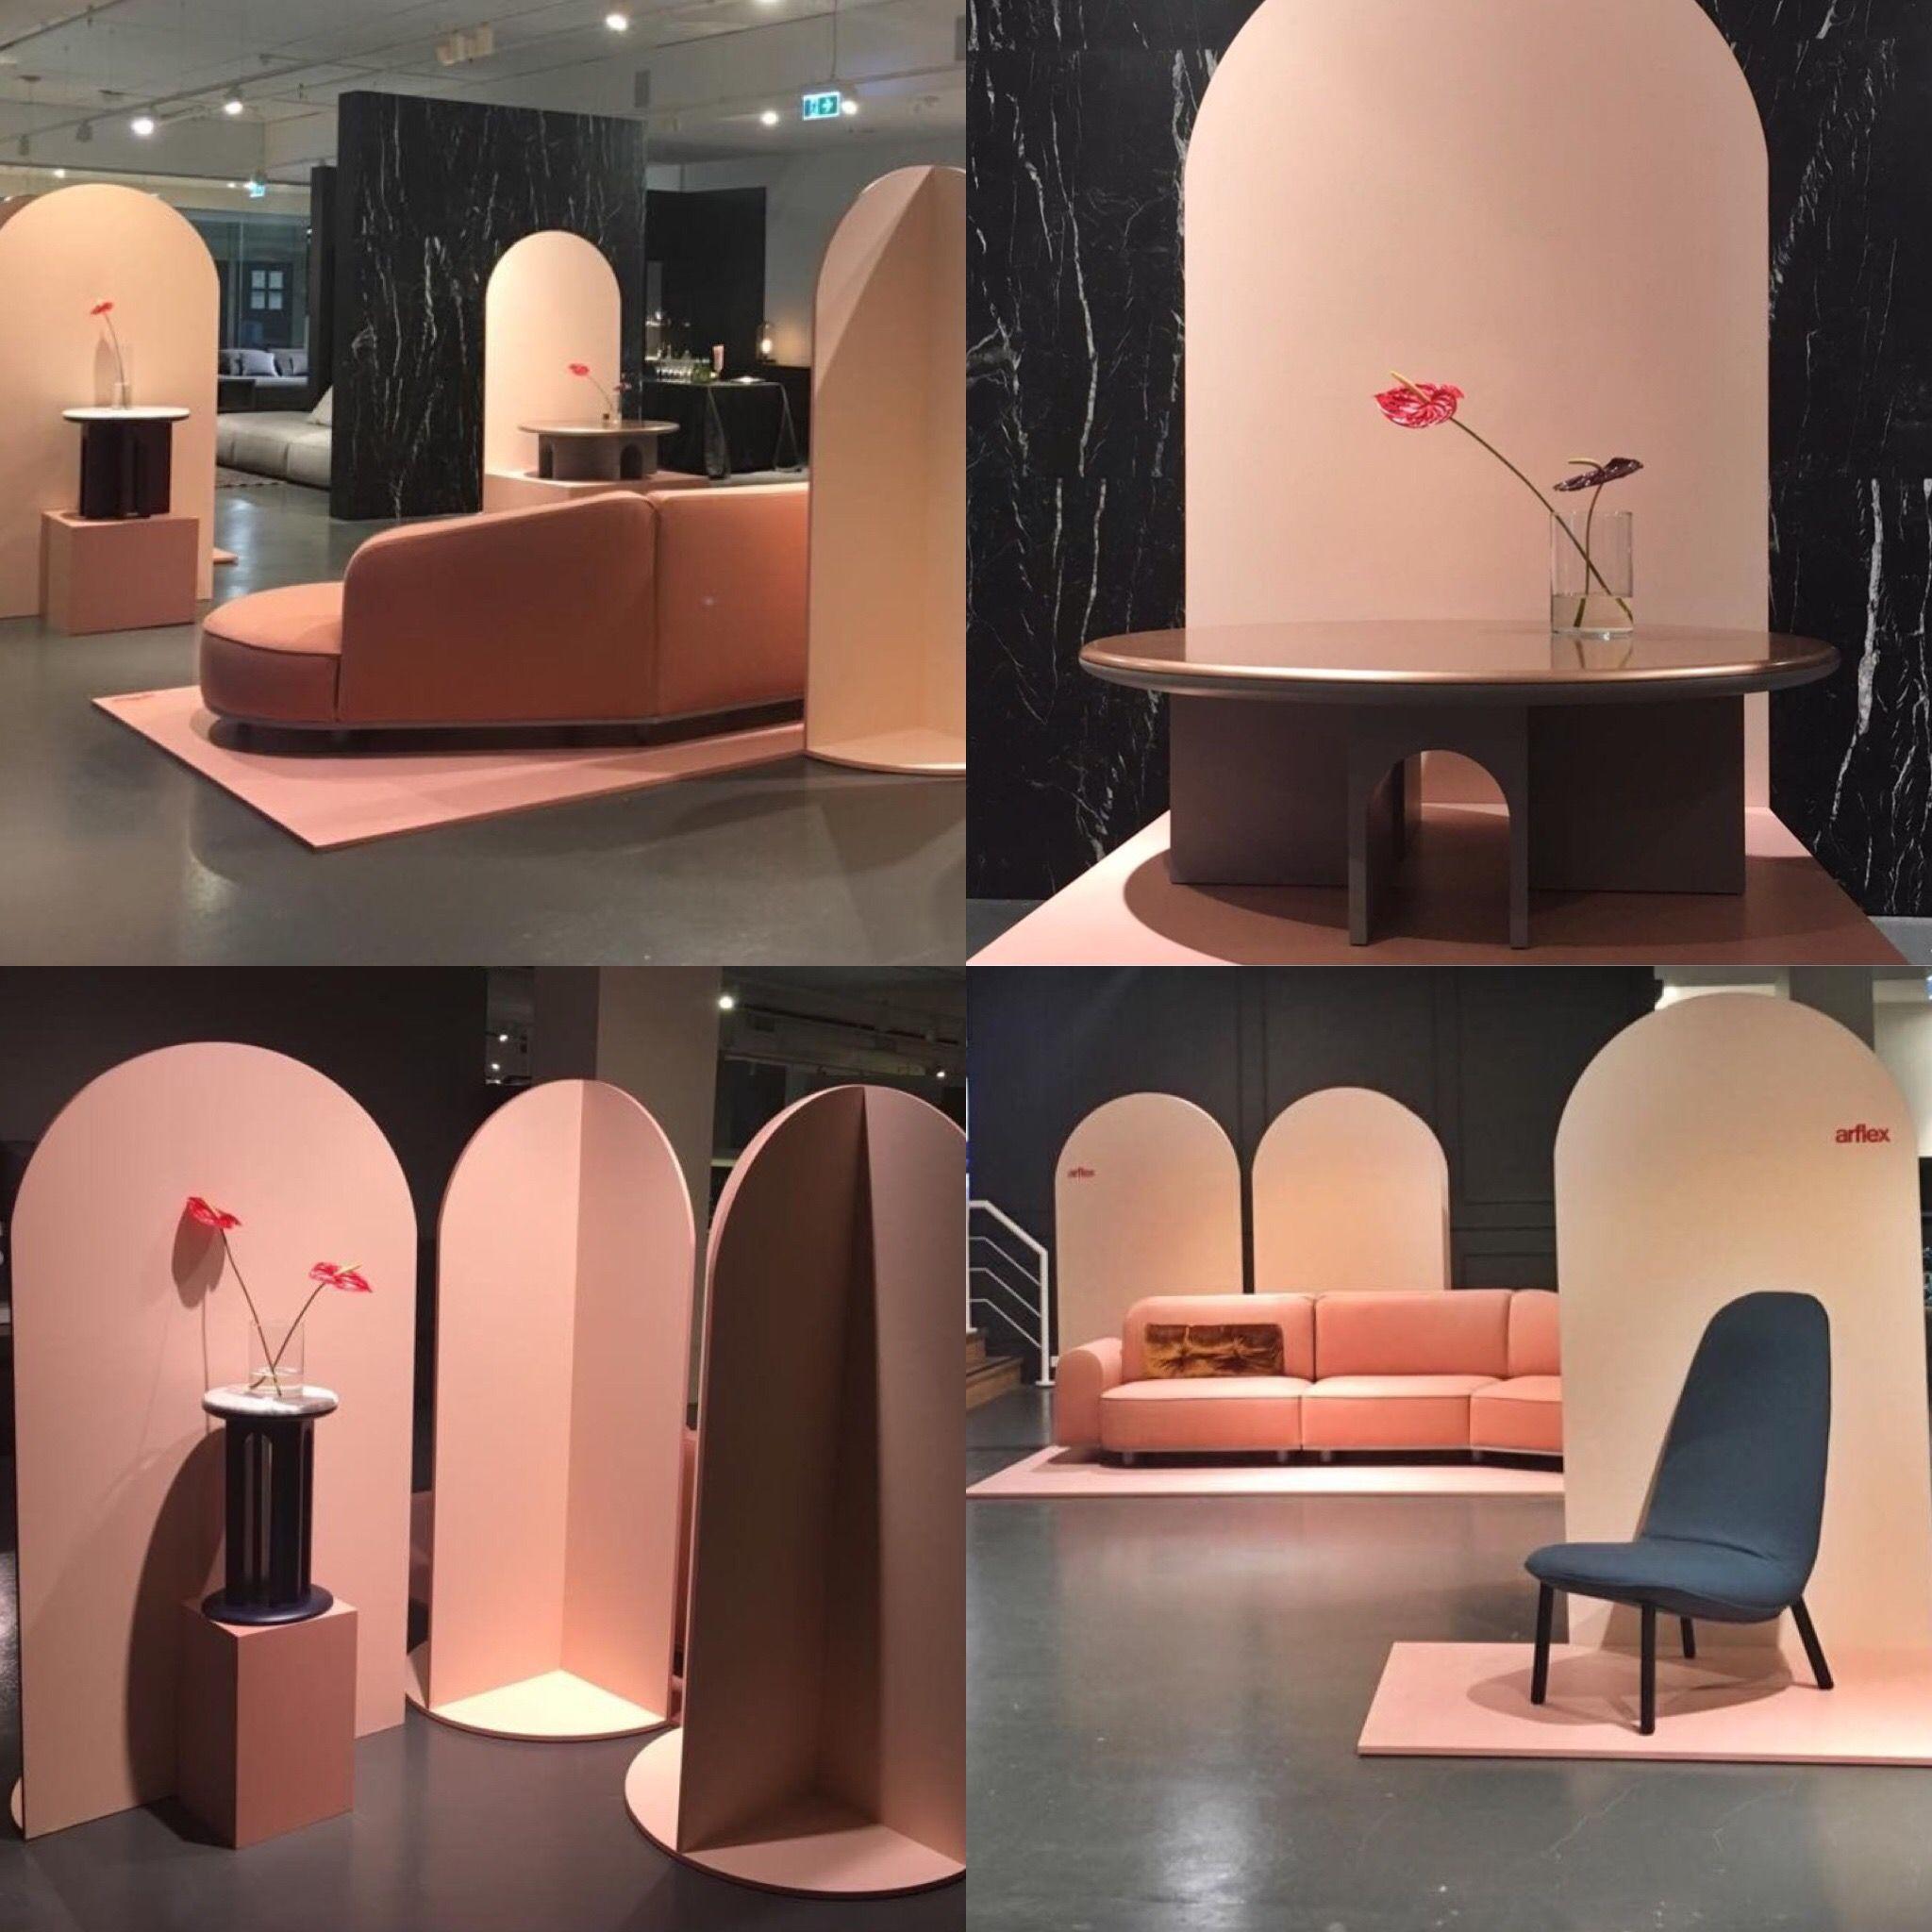 #arflex #arcolor #sofa #leafo #armchair #design @jaimehayon #australia #sydney #luxury #madeinitaly #bestoftheday #interiorinspiration #italianstyle #italianbrand #staytuned www.arflex.com